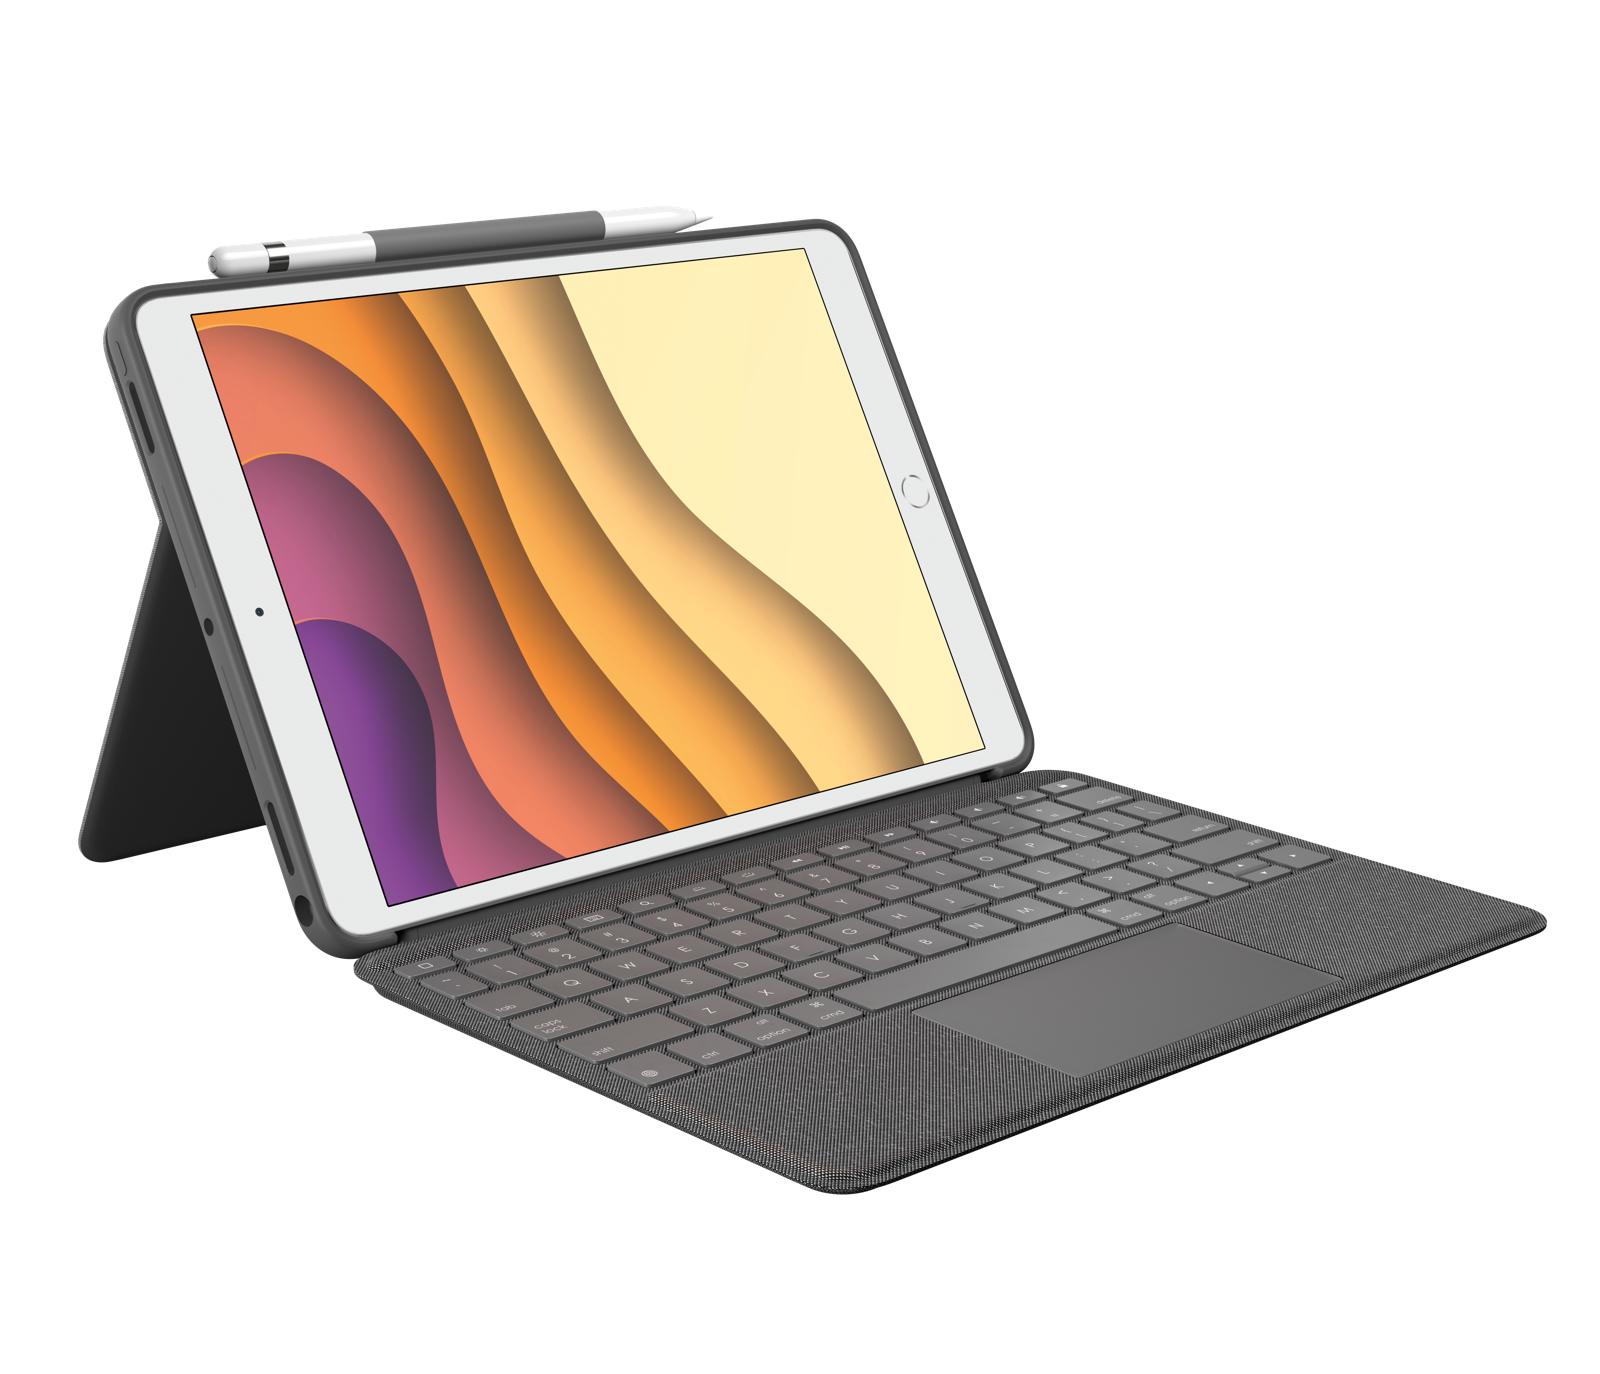 Logitech Combo Touch teclado para móvil QWERTZ Suizo Grafito Smart Connector